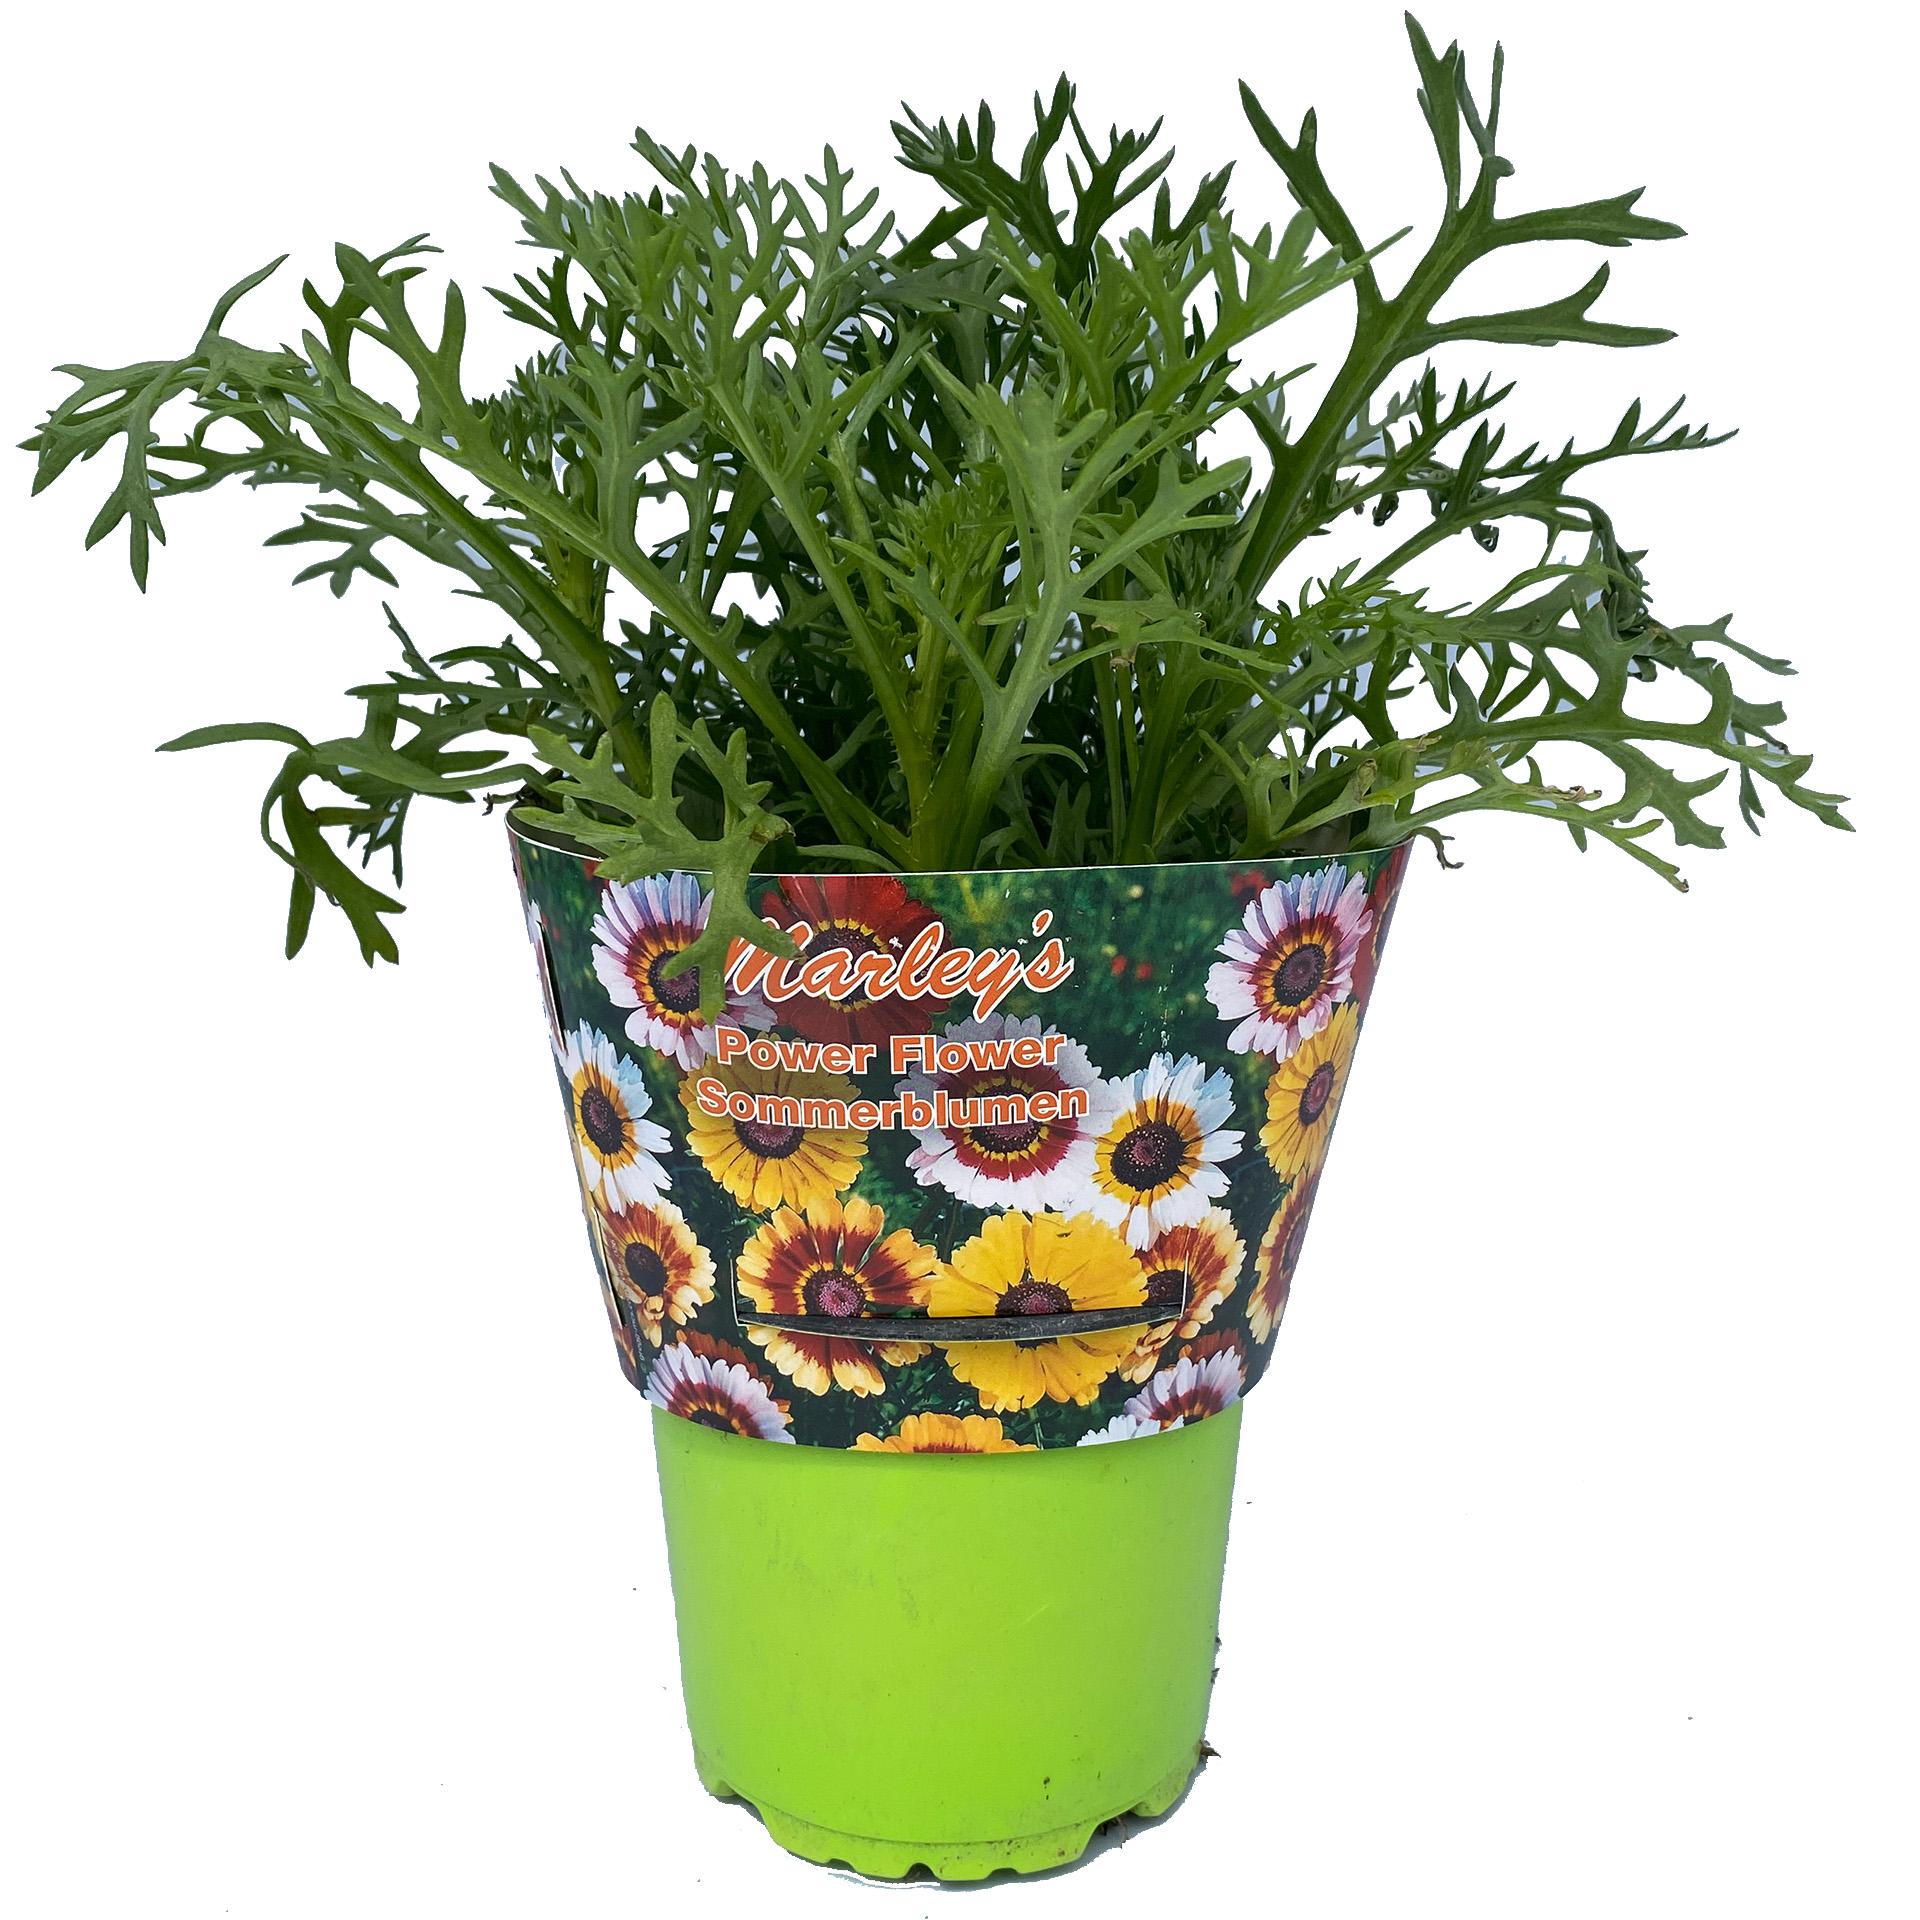 Herbst-Chrysantheme - Chrysanthemum indicum 'Marley's Farbmix', 12cm Topf